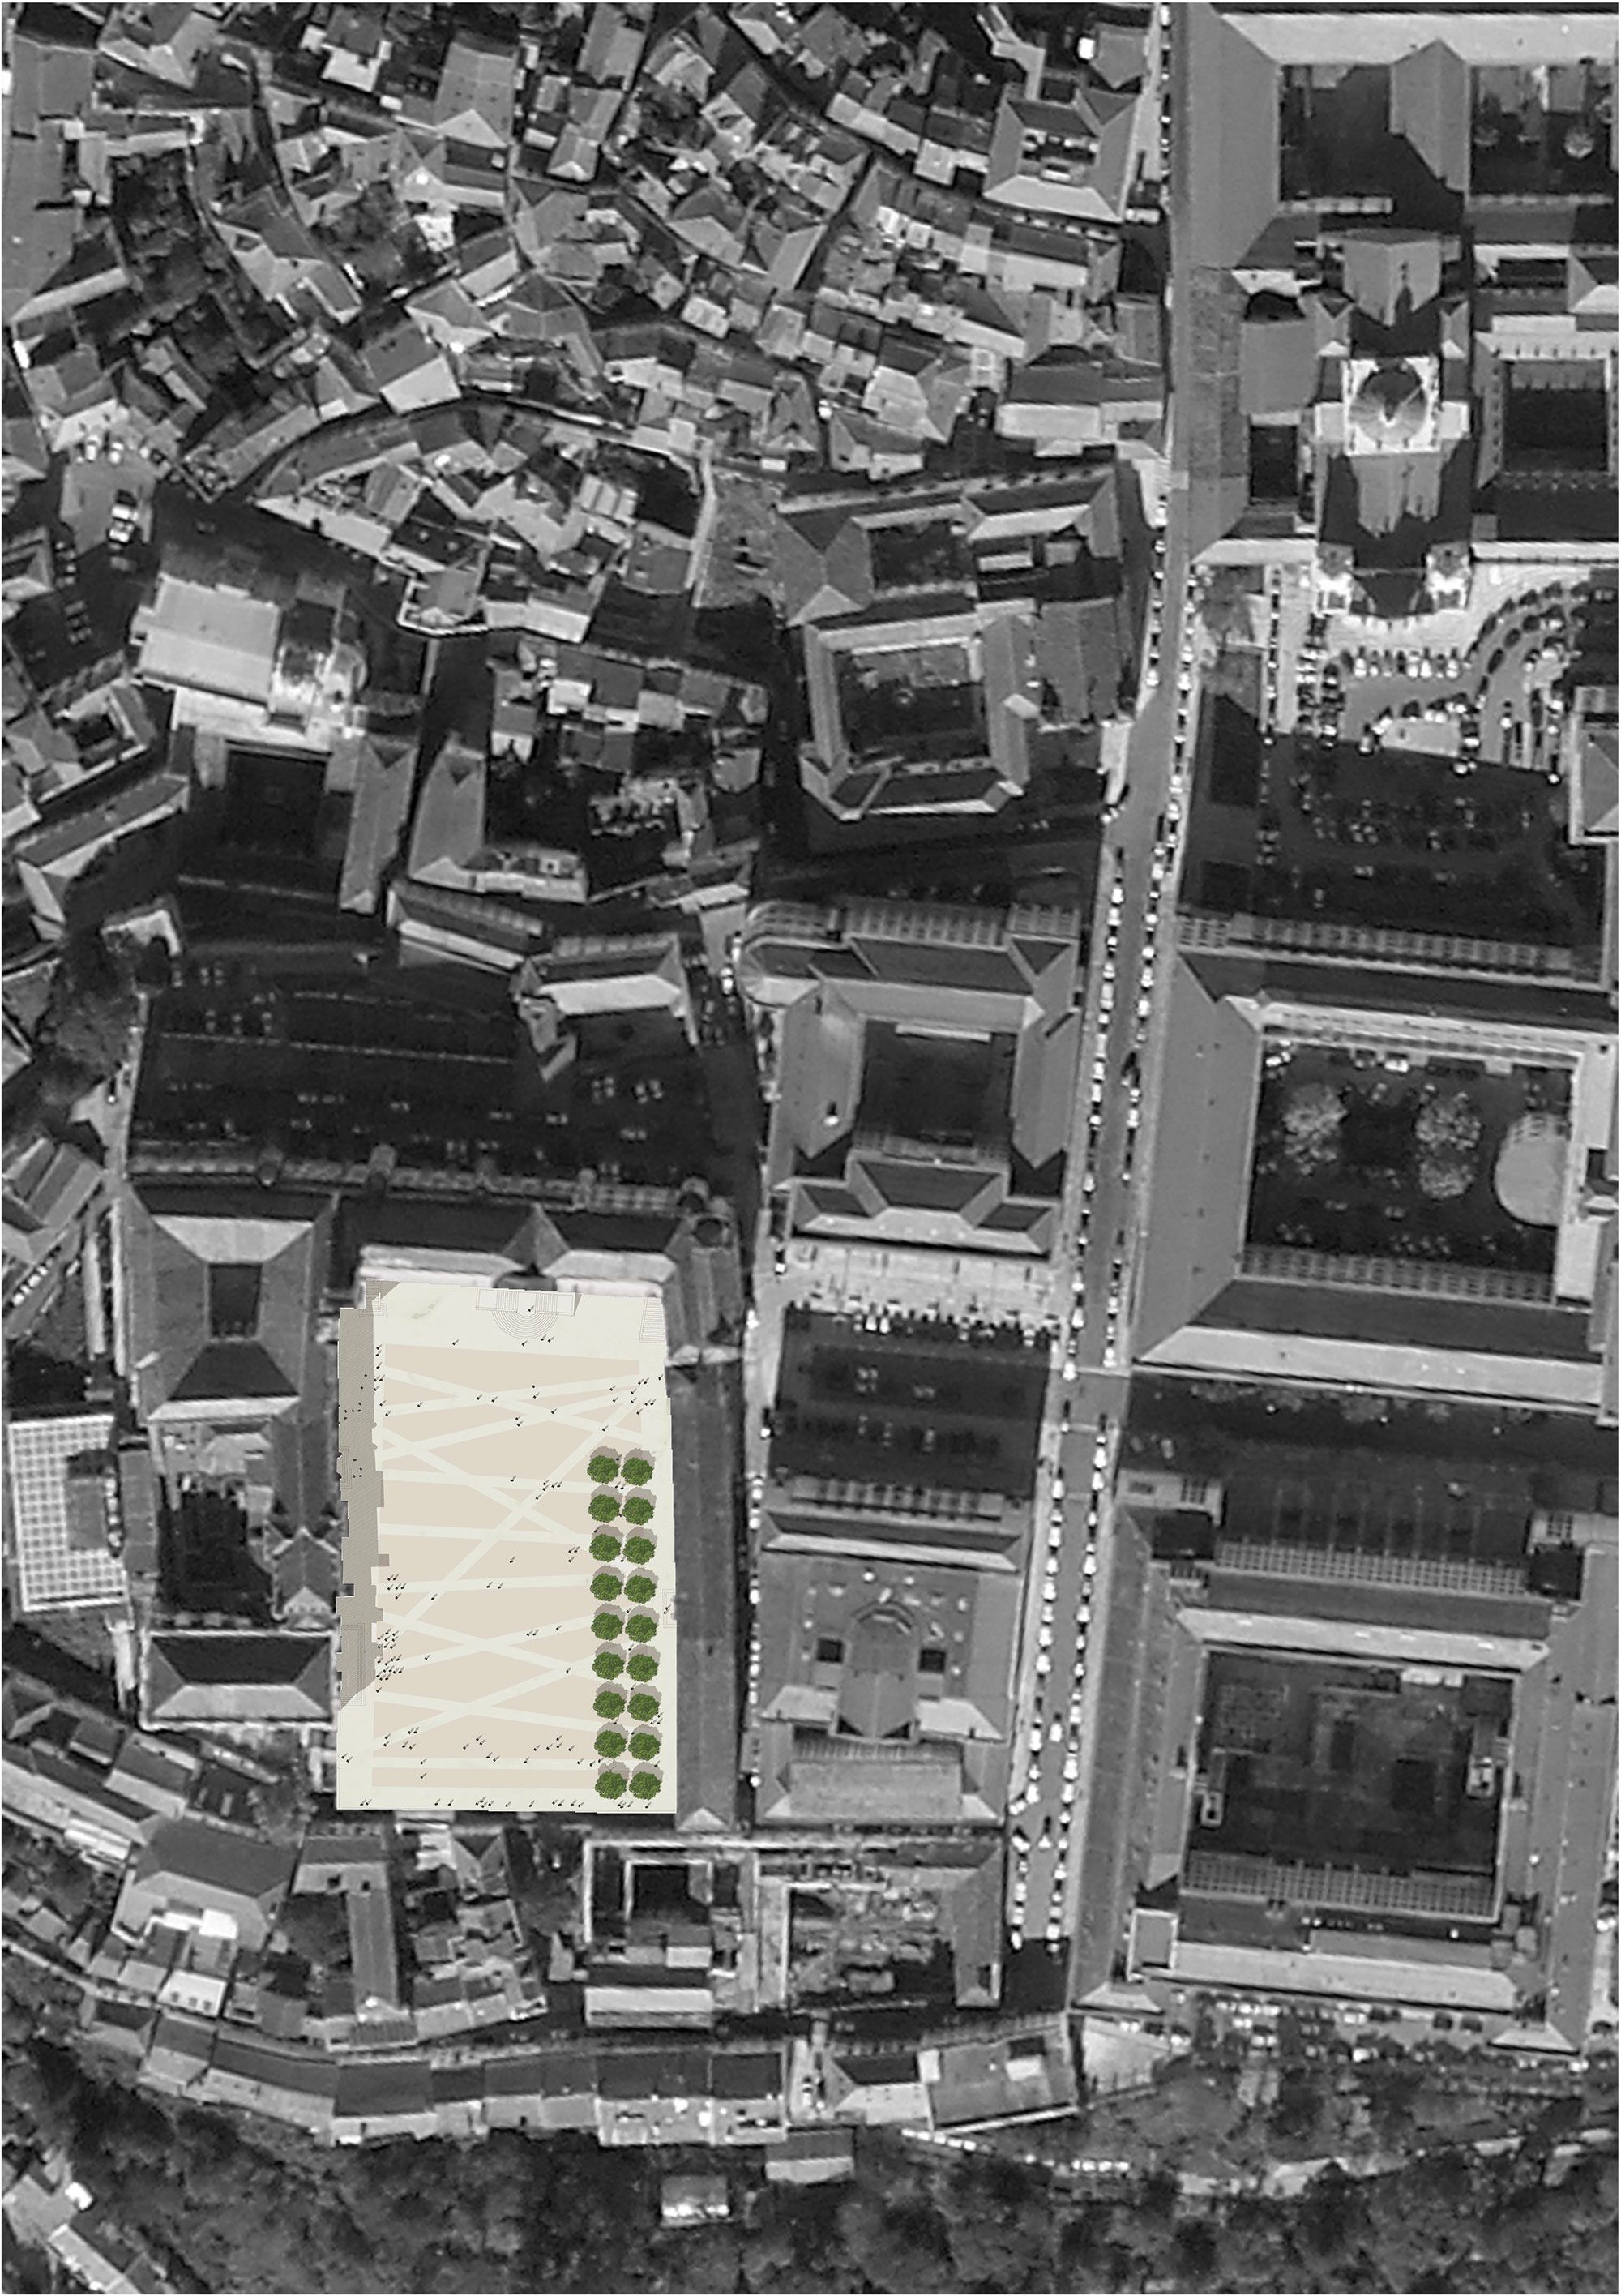 Pátio das Escolas Coimbra BB Arquitectos, Gonçalo Byrne, arquitectos Lda.